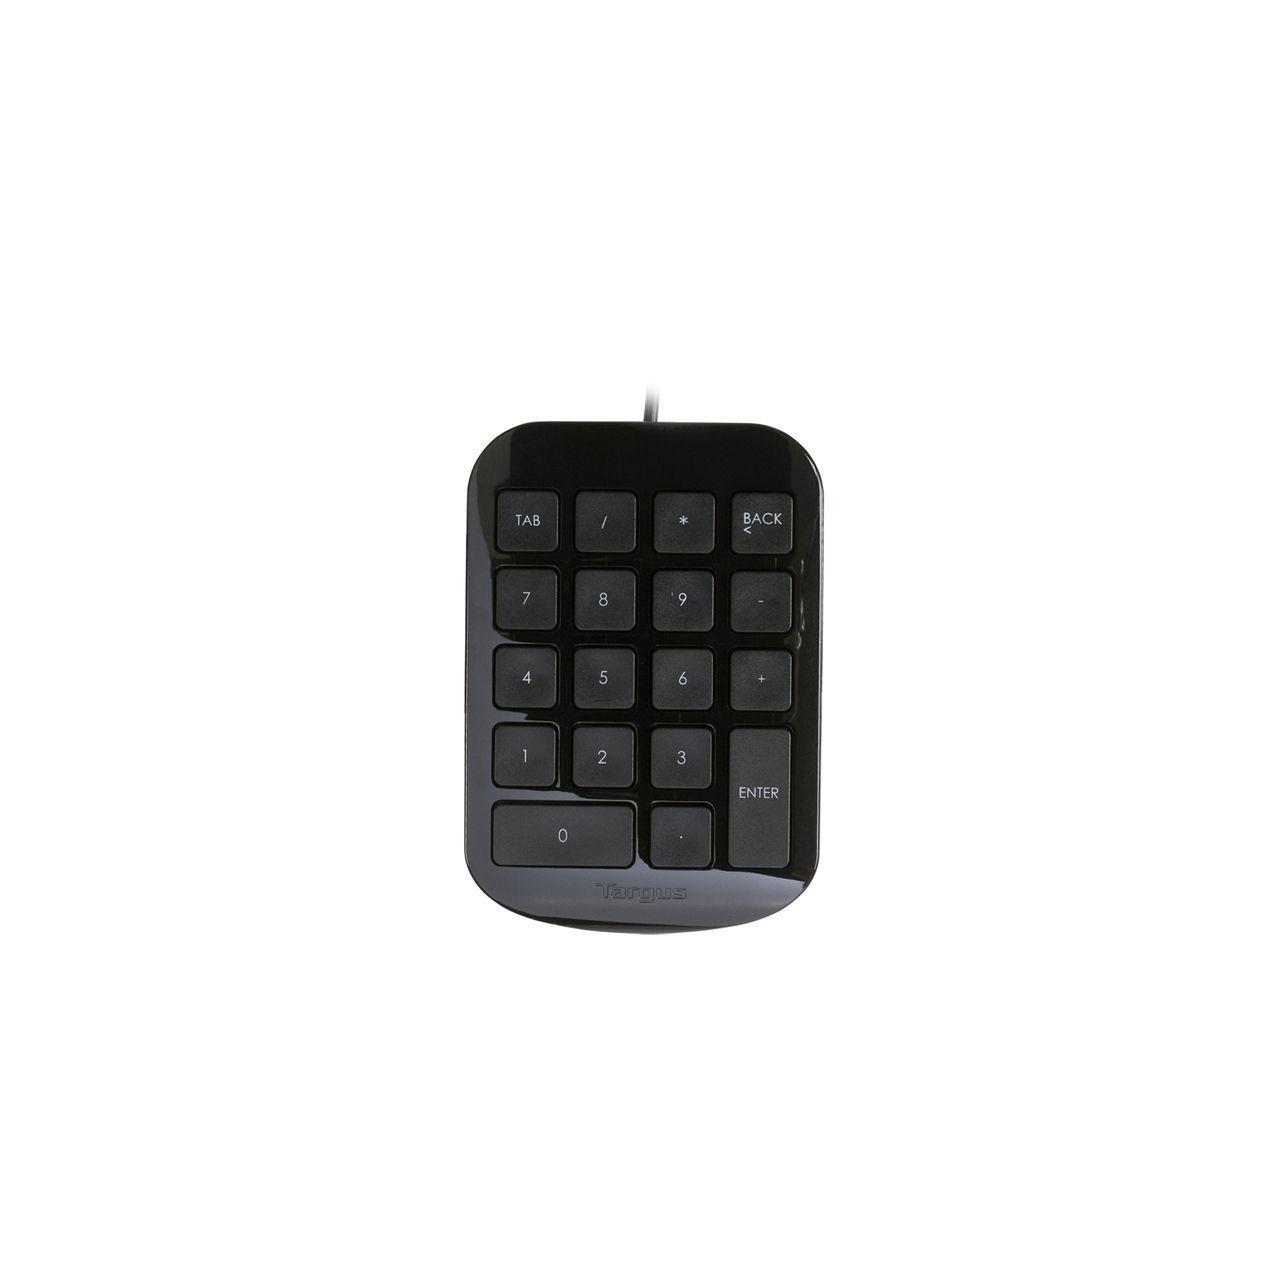 numeriek toetsenbord ct toetsenbord ERKATAR101 Voorkant